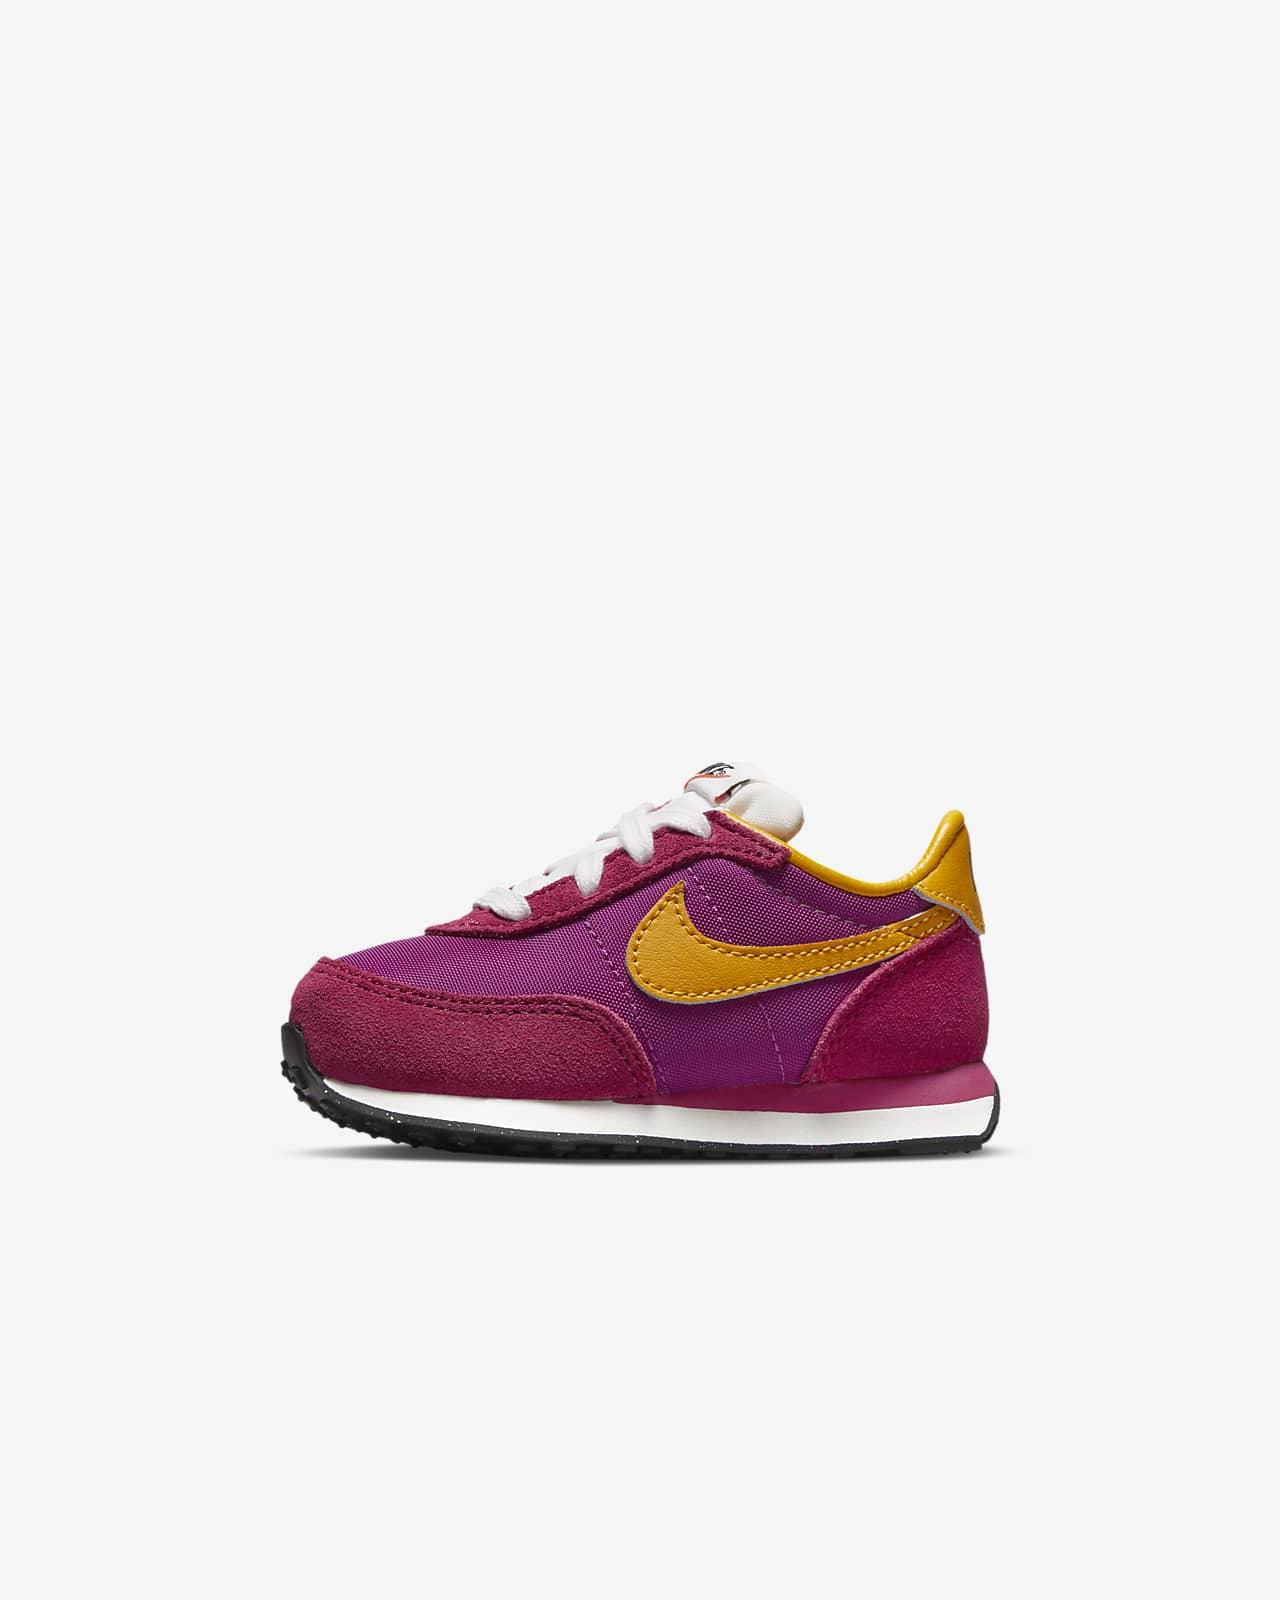 Nike Waffle Trainer 2 SP Baby/Toddler Shoe